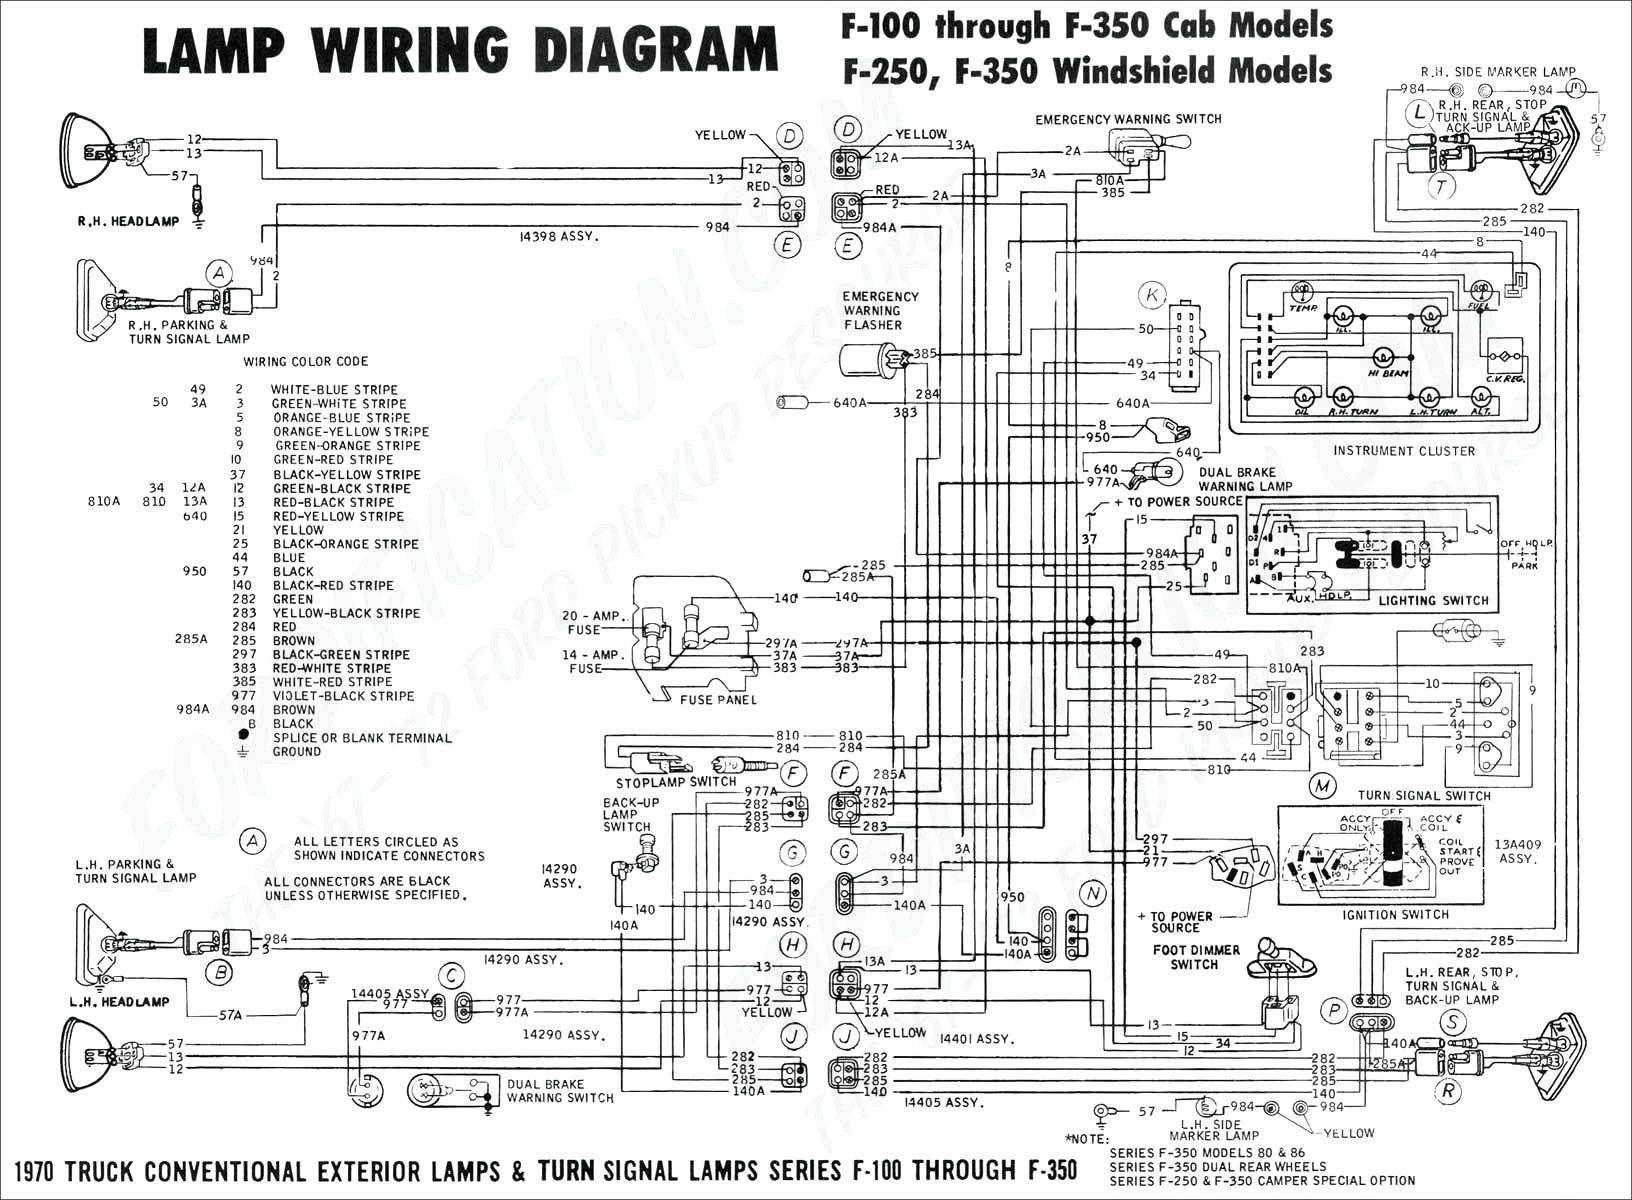 Car Engine Oil Flow Diagram 534 ford Oil Filter Diagram House Wiring Diagram Symbols • Of Car Engine Oil Flow Diagram